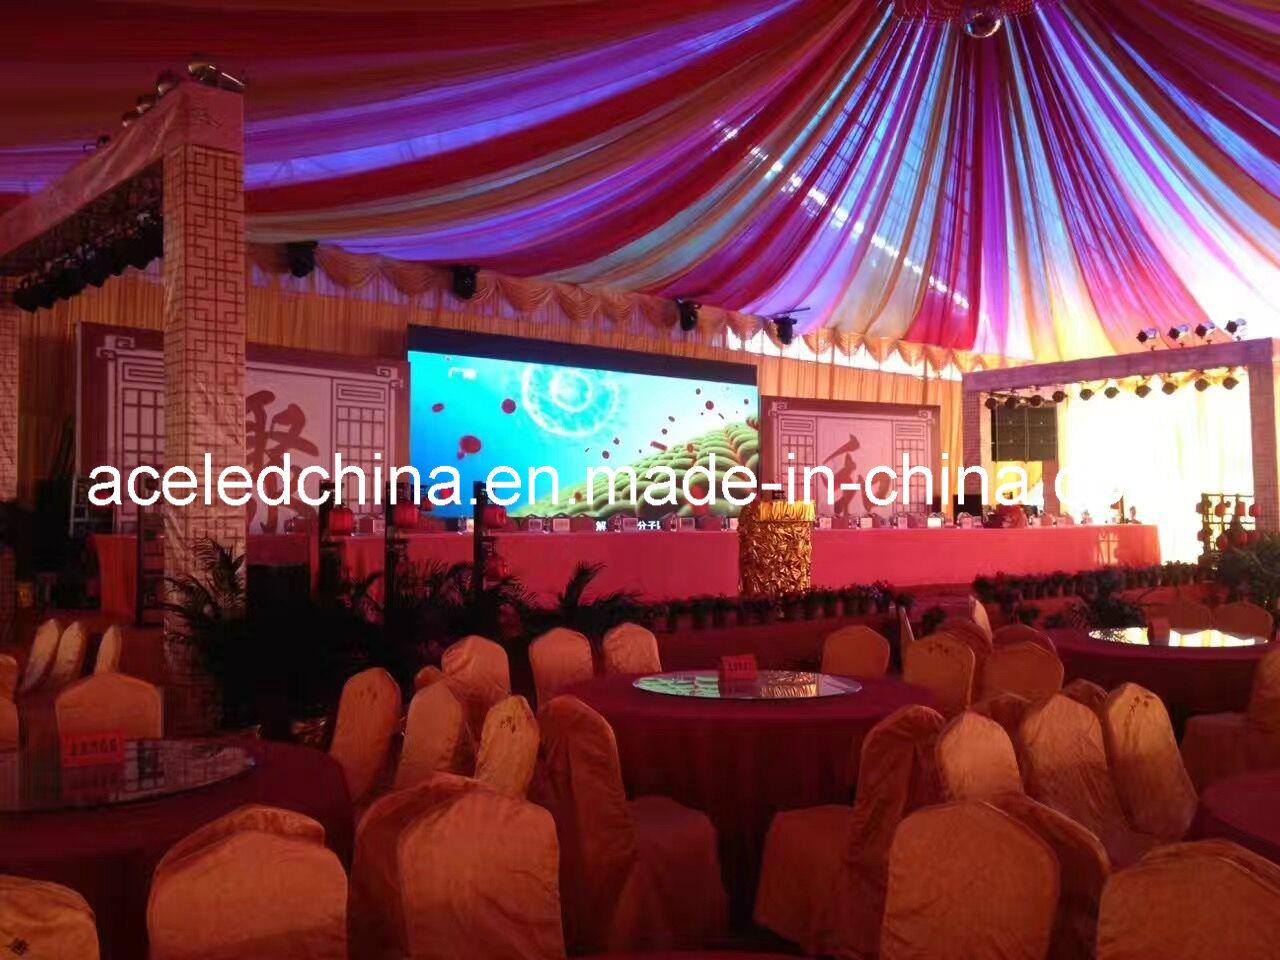 P5 Indoor Advertising Media Lighting Visual Big Digital Electronic LED Display